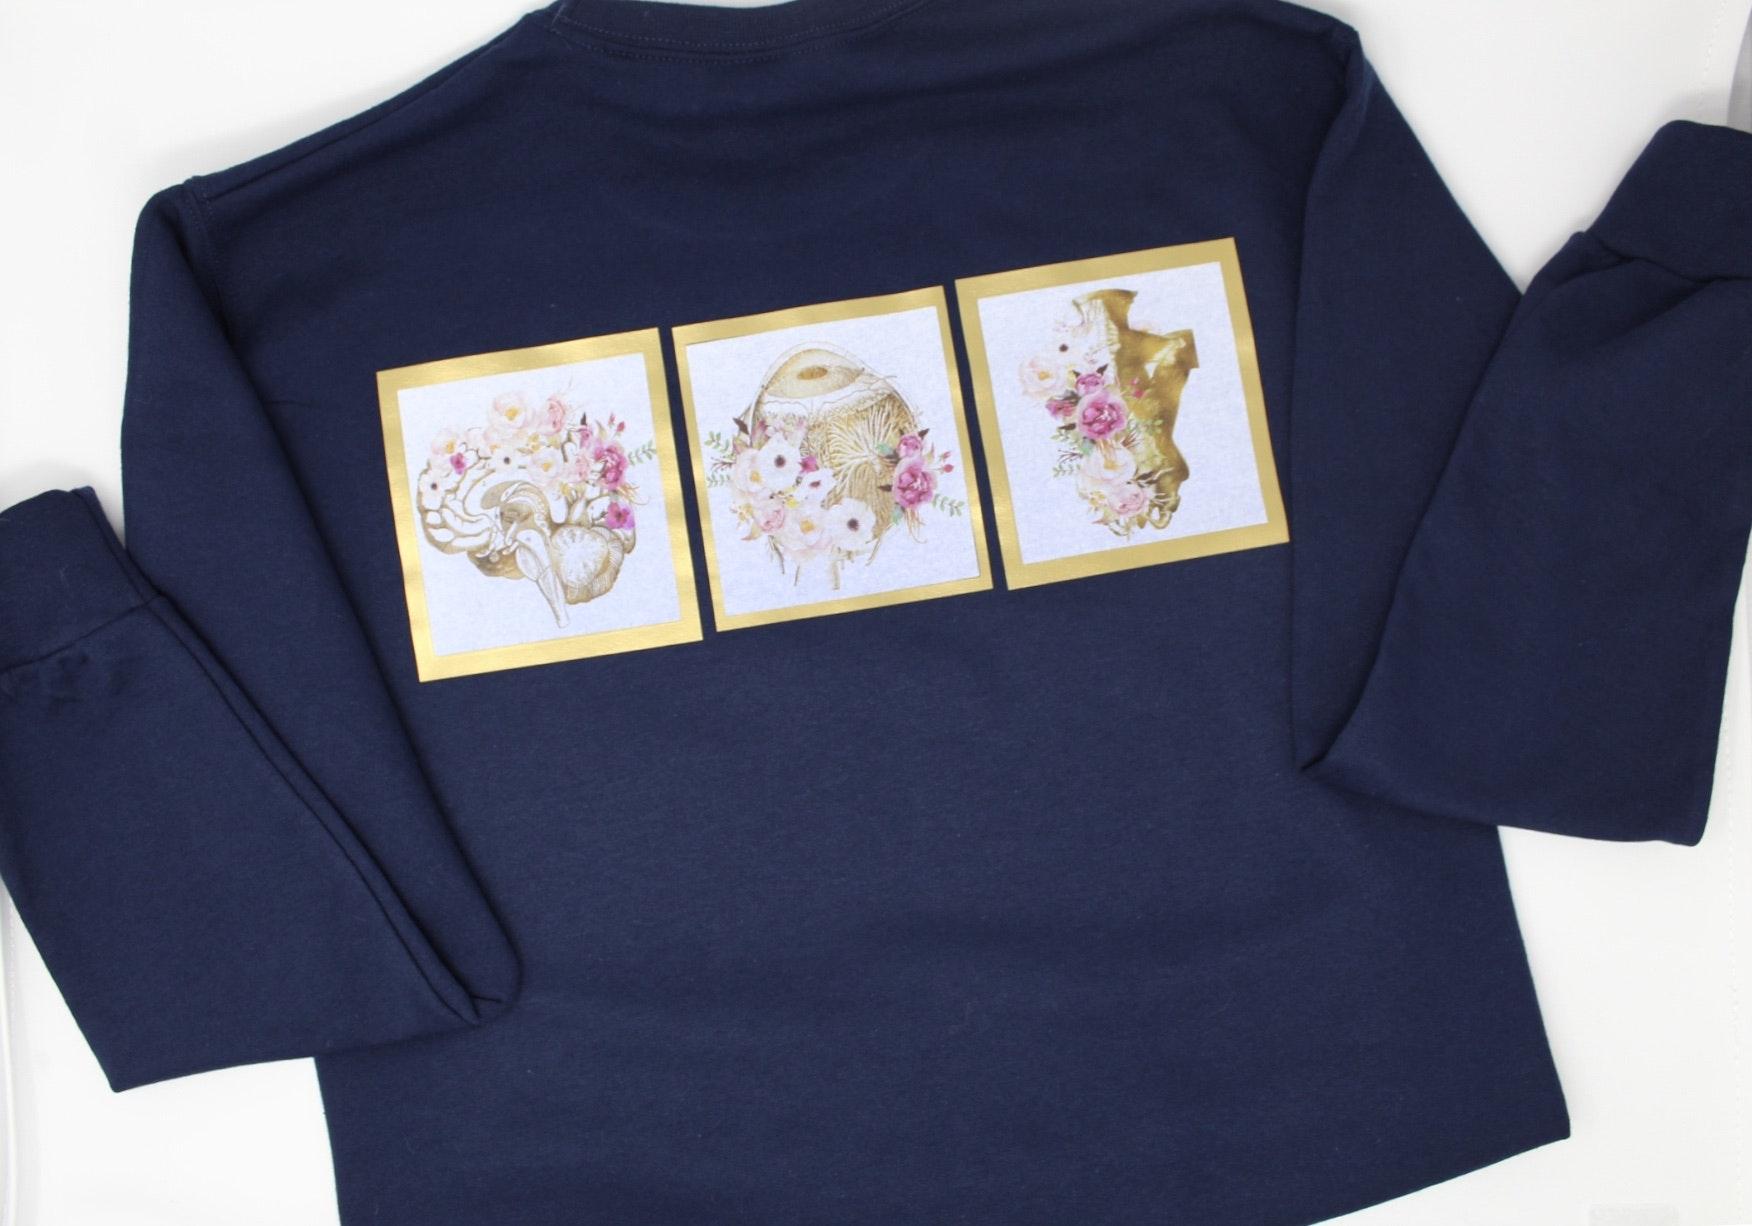 Jerzees 562 customer review by Jennifer Carter Good Quality Sweatshirt